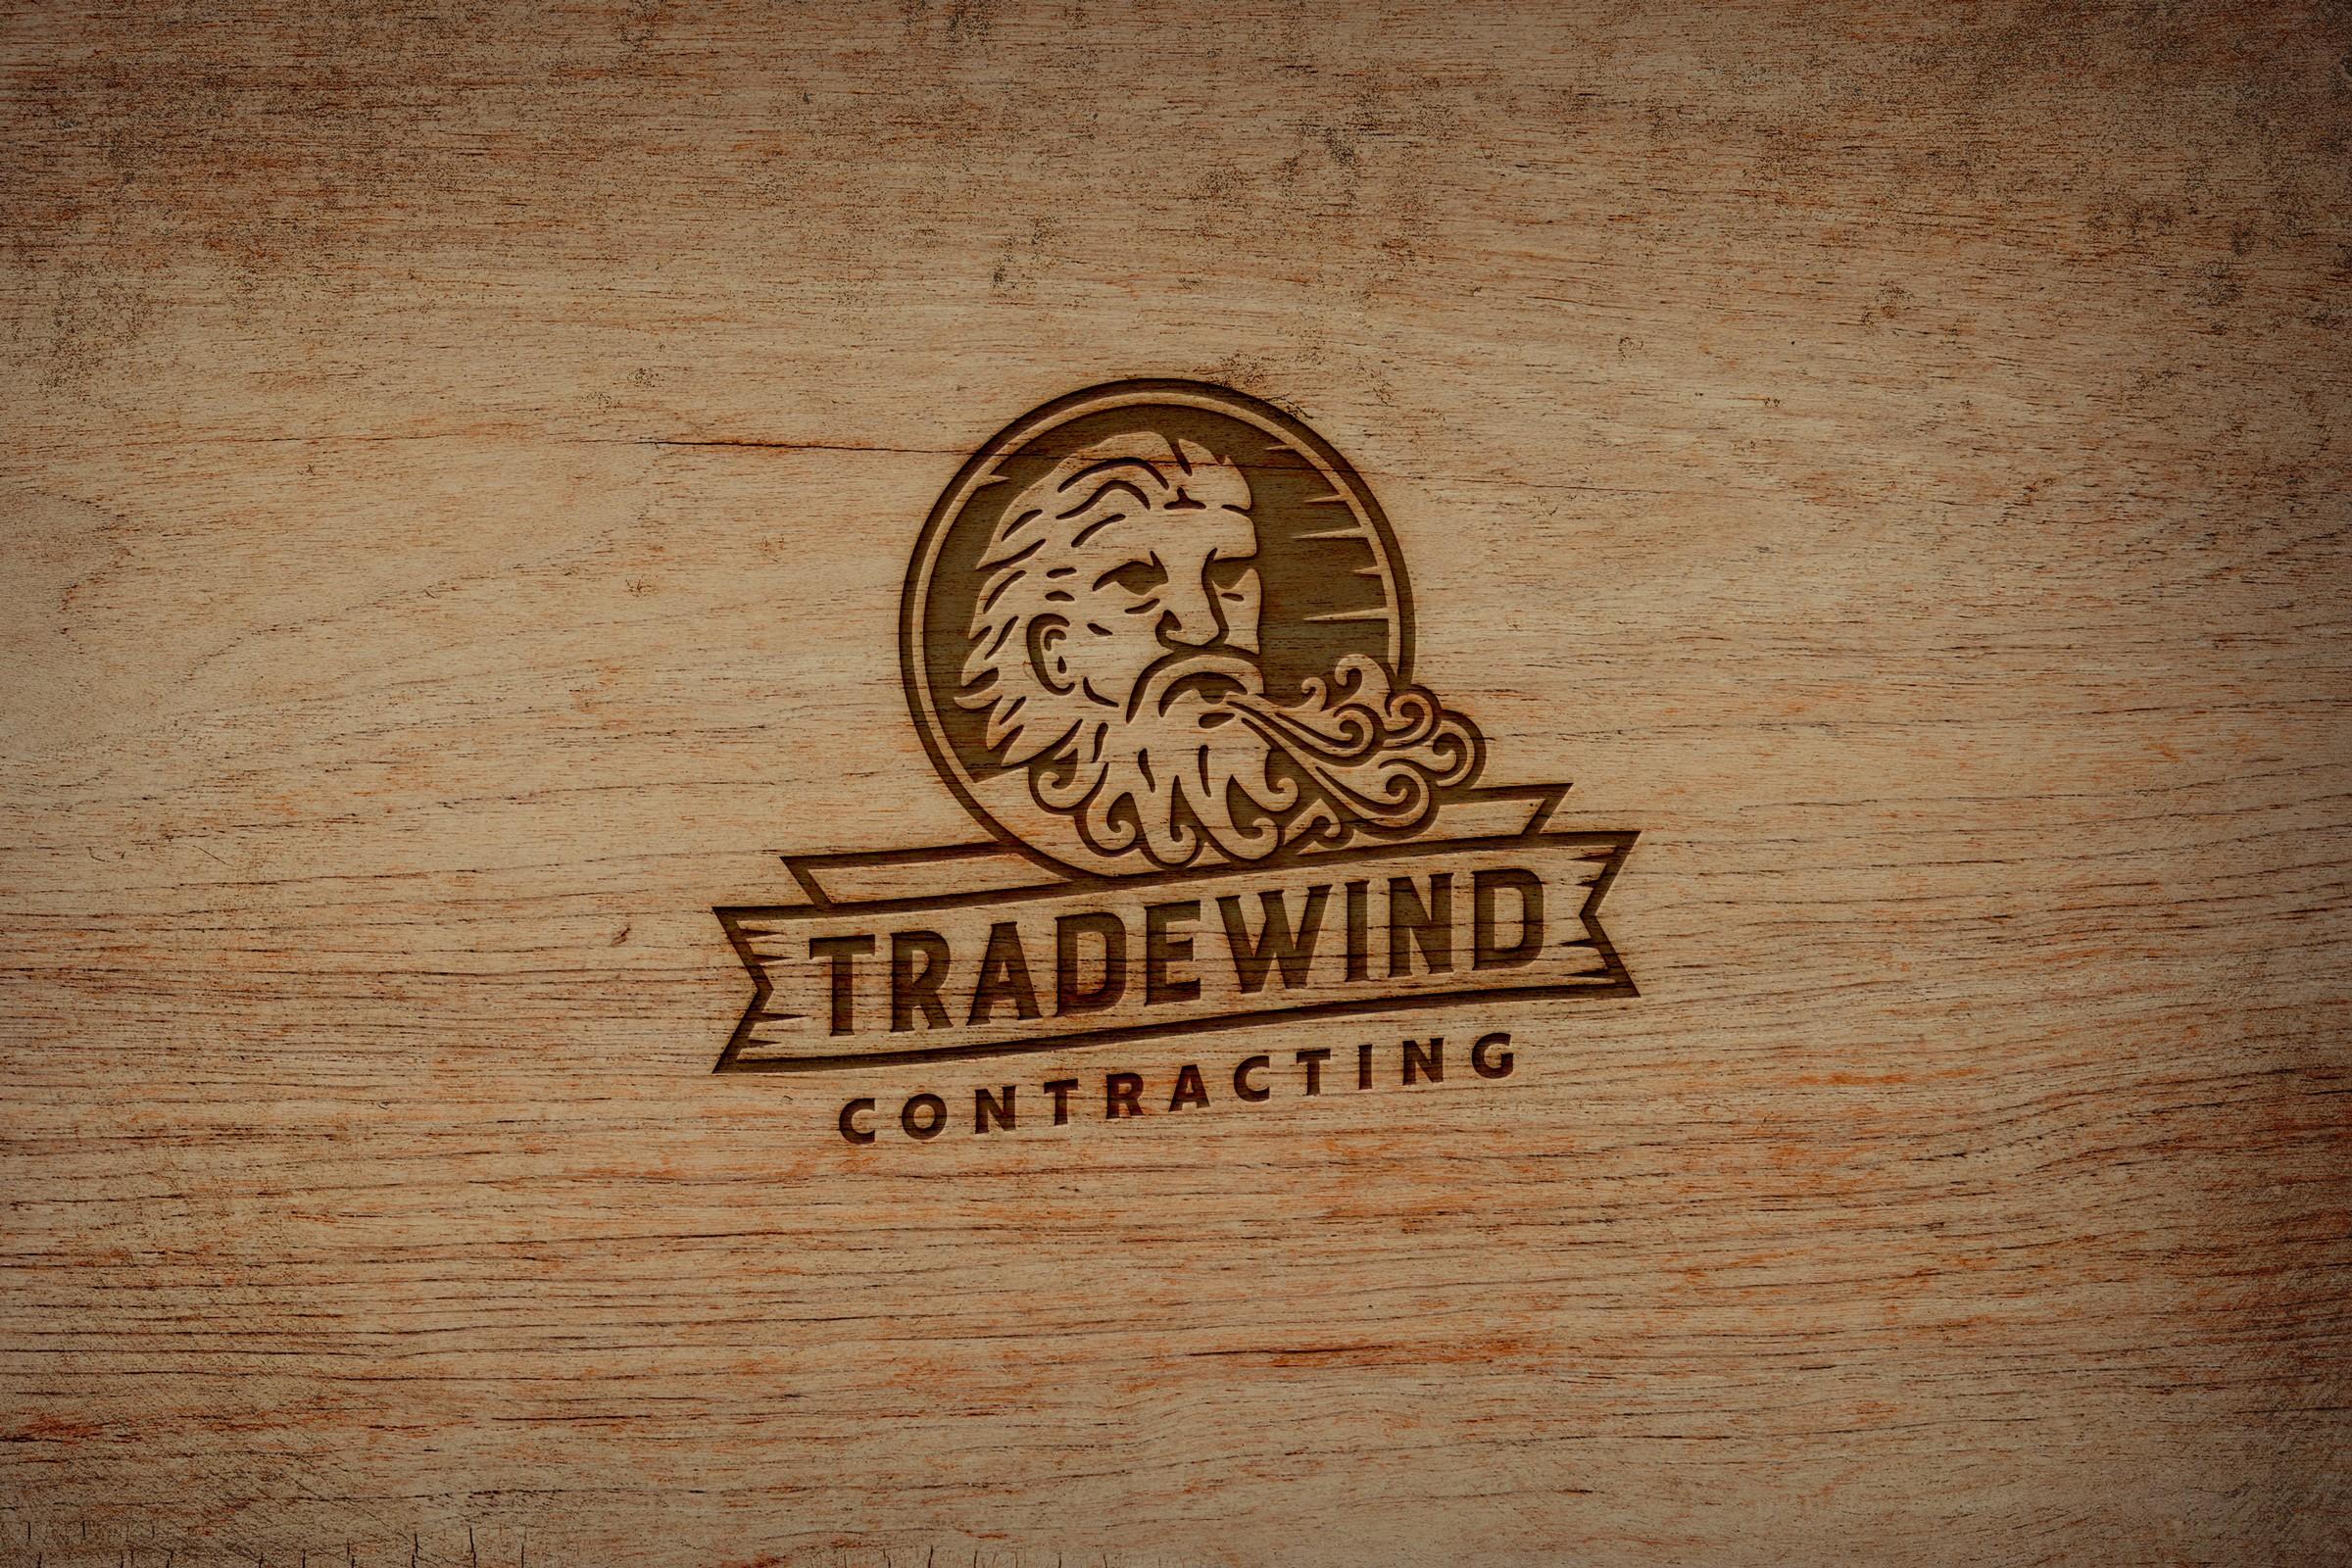 Tailor made logo design